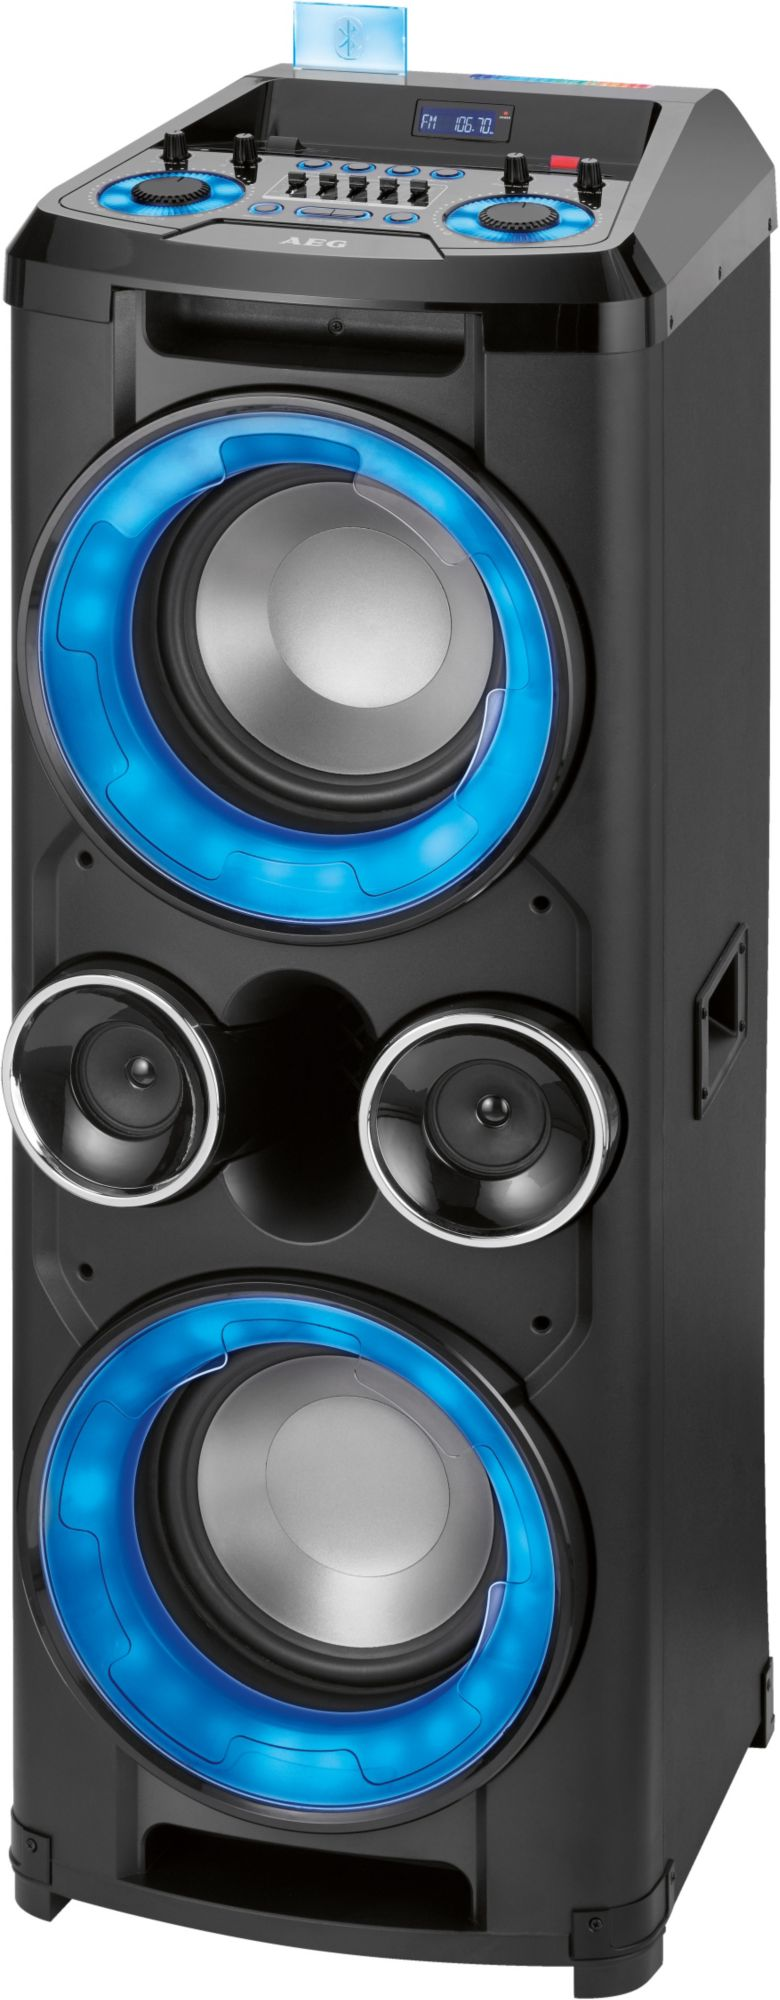 AEG  EC 4836 FM/BT/USB/AUX XXXL-Entertainment Center schwarz